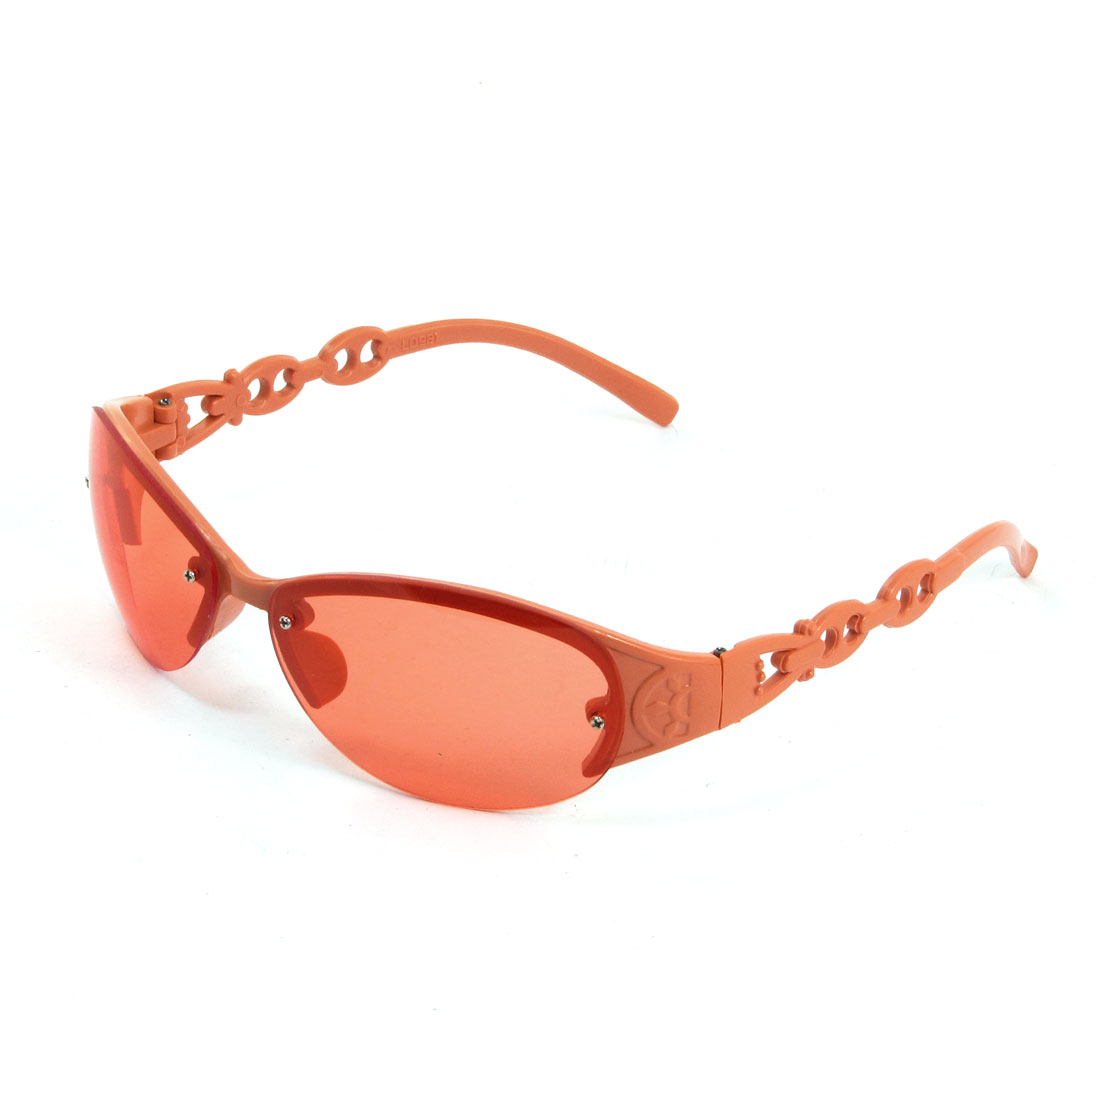 Orange Plastic Full Frame Outdoor Sunglasses Eyewear for Woman